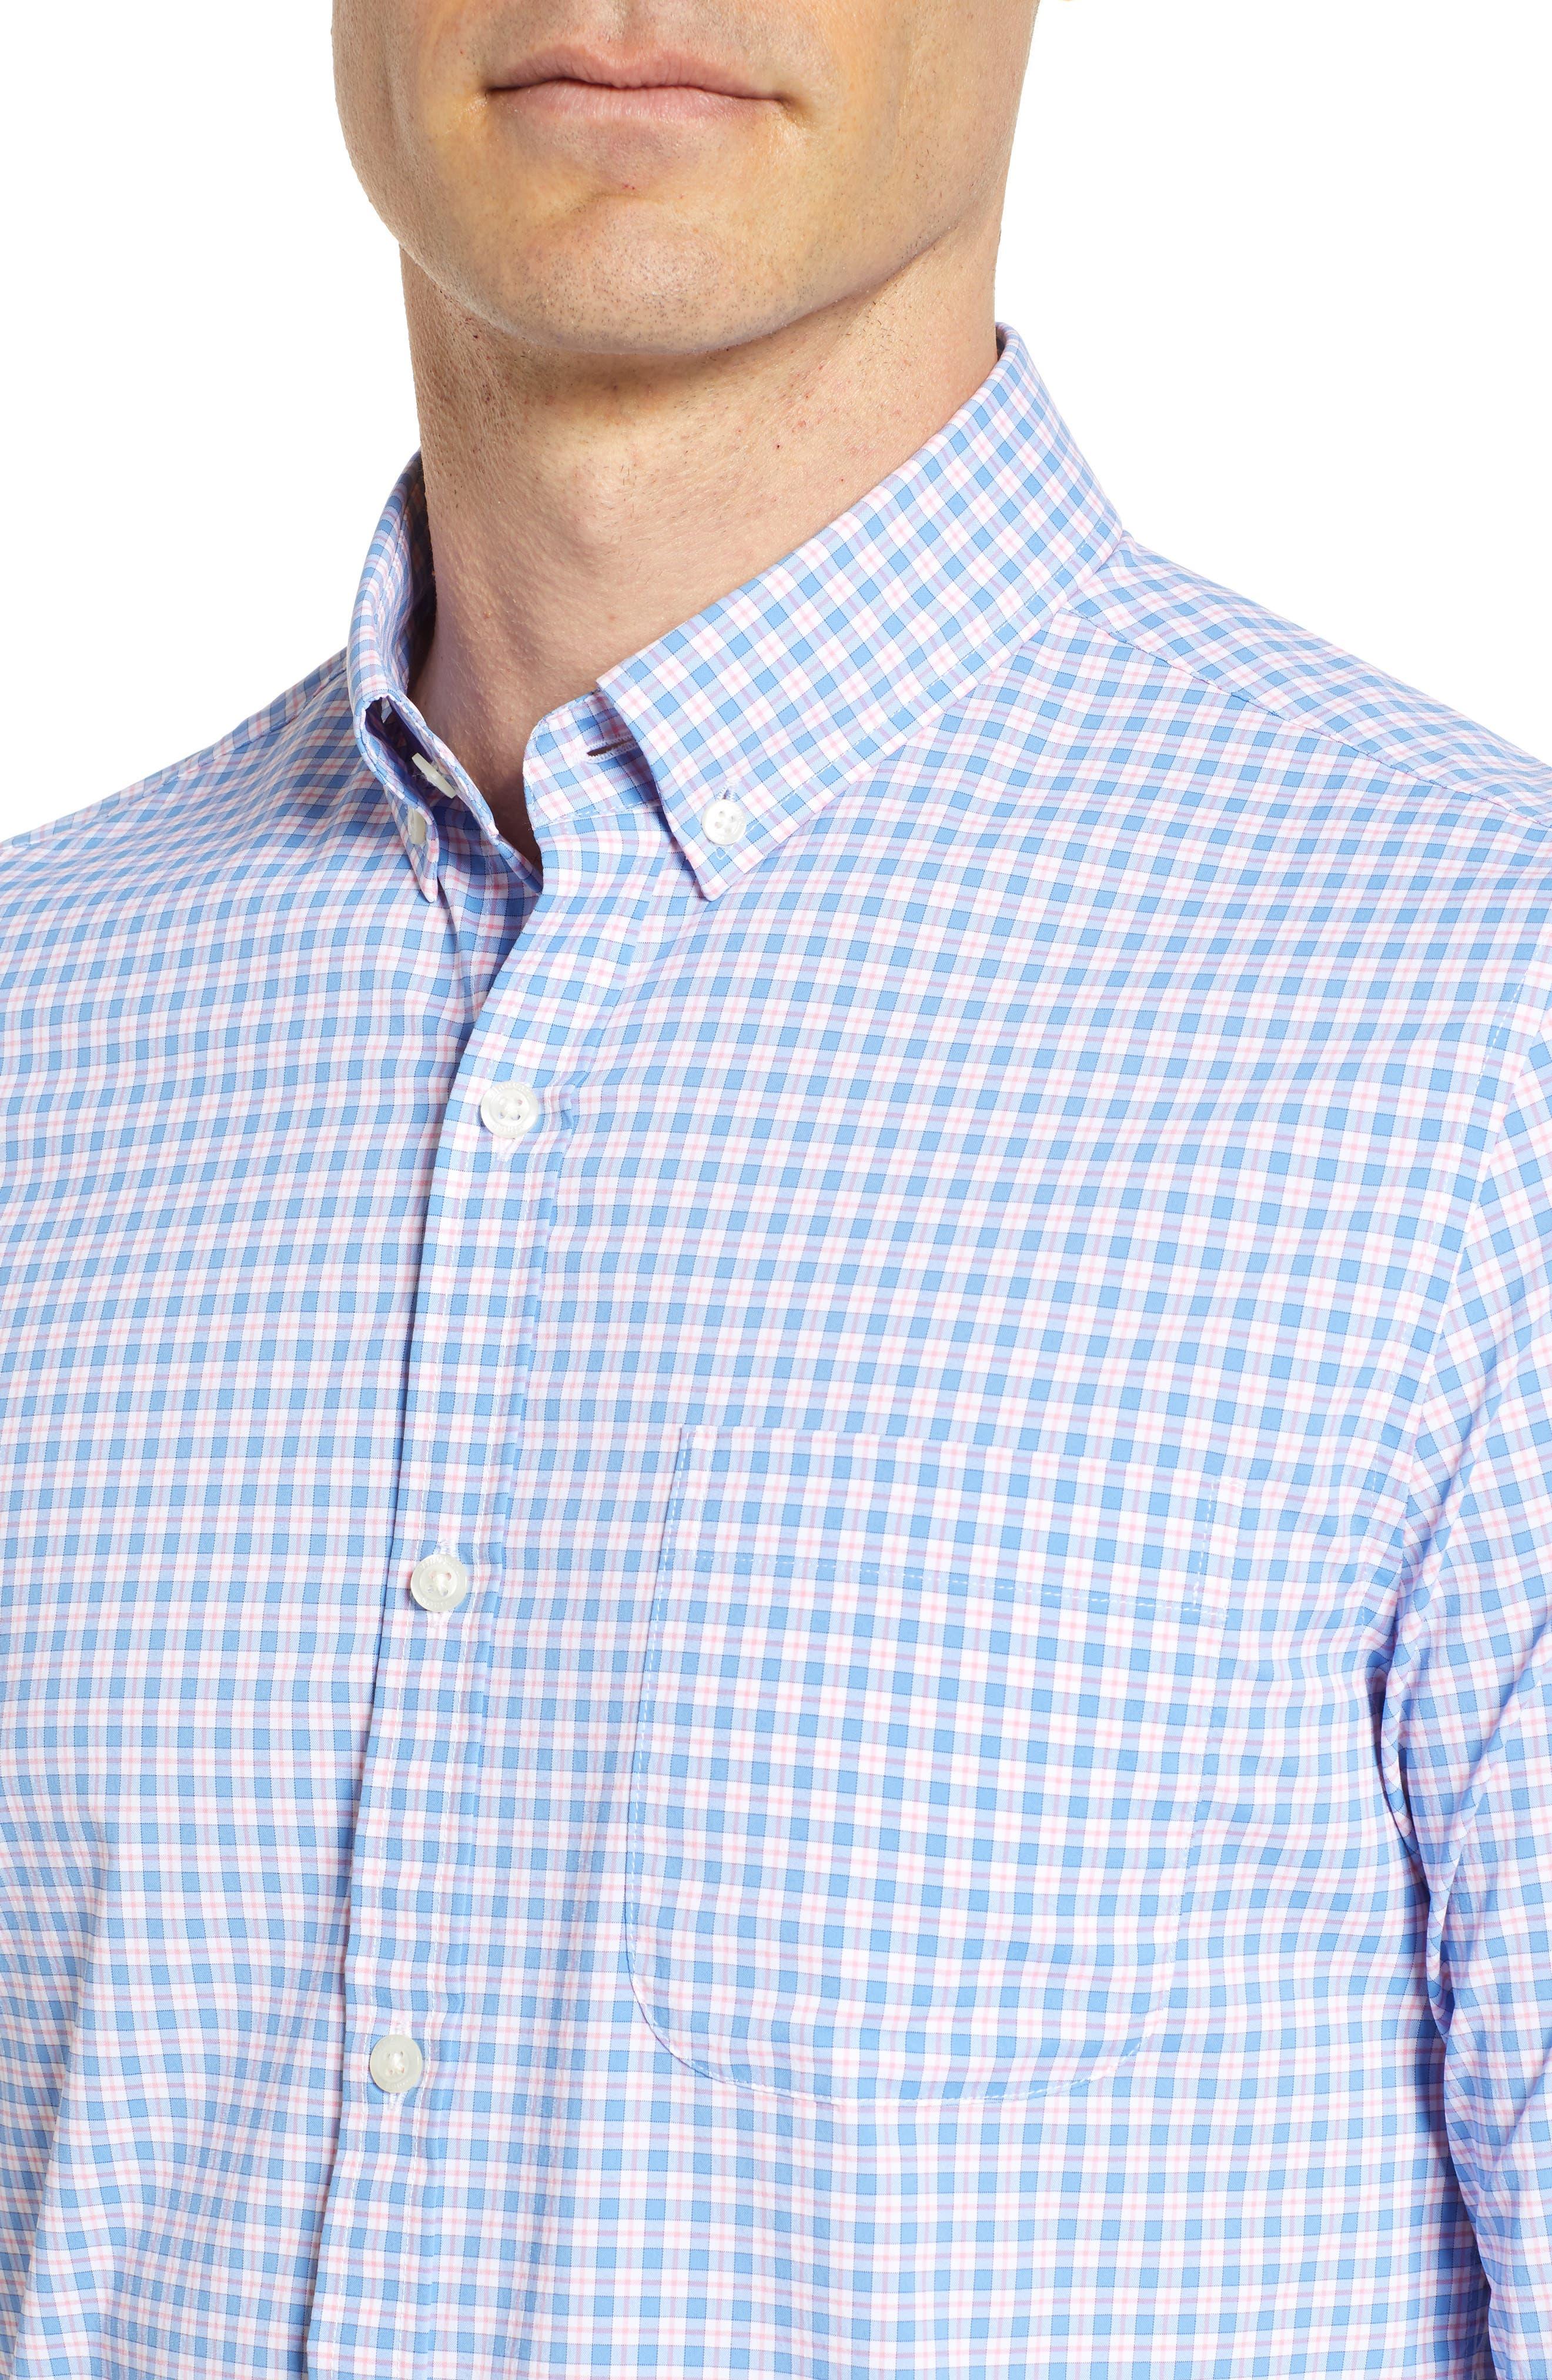 Oyster Pond Slim Fit Plaid Sport Shirt,                             Alternate thumbnail 4, color,                             OCEAN BREEZE